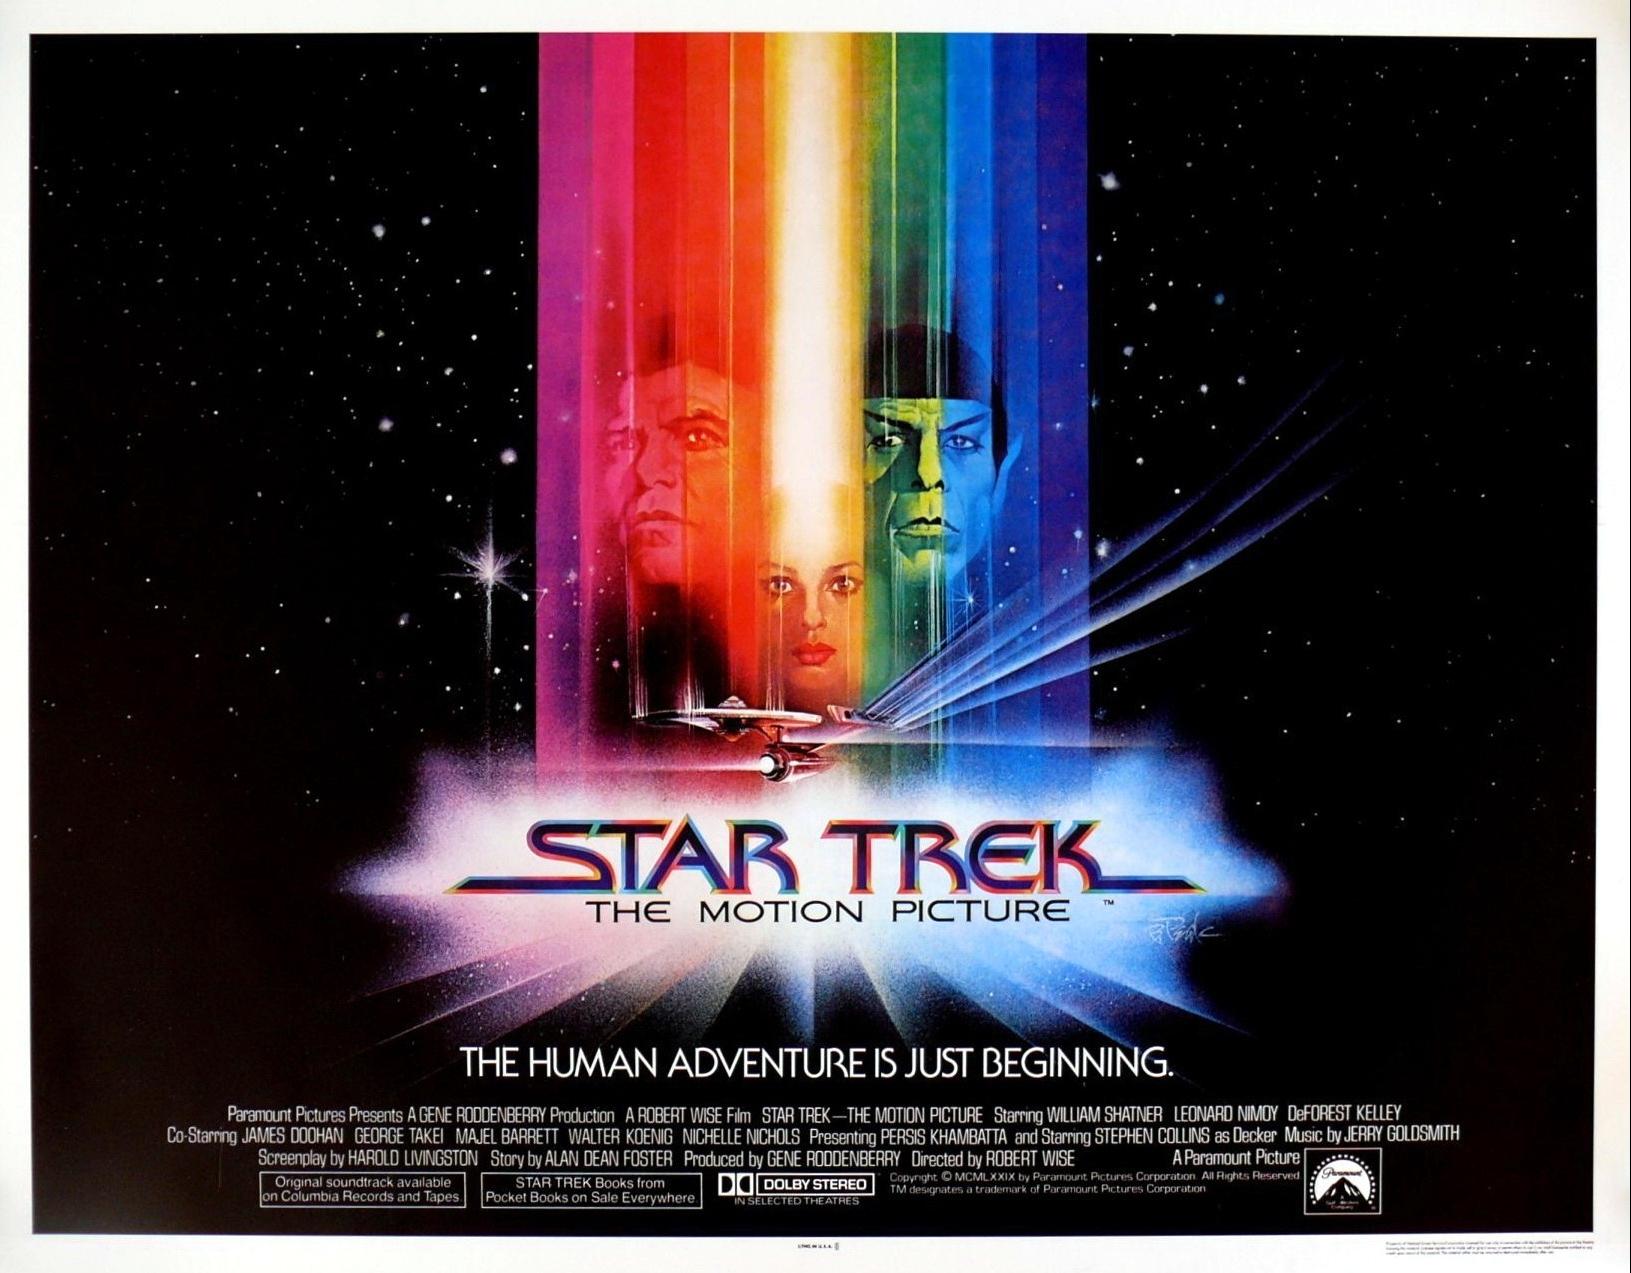 Star Trek The Motion Picture Poster Art